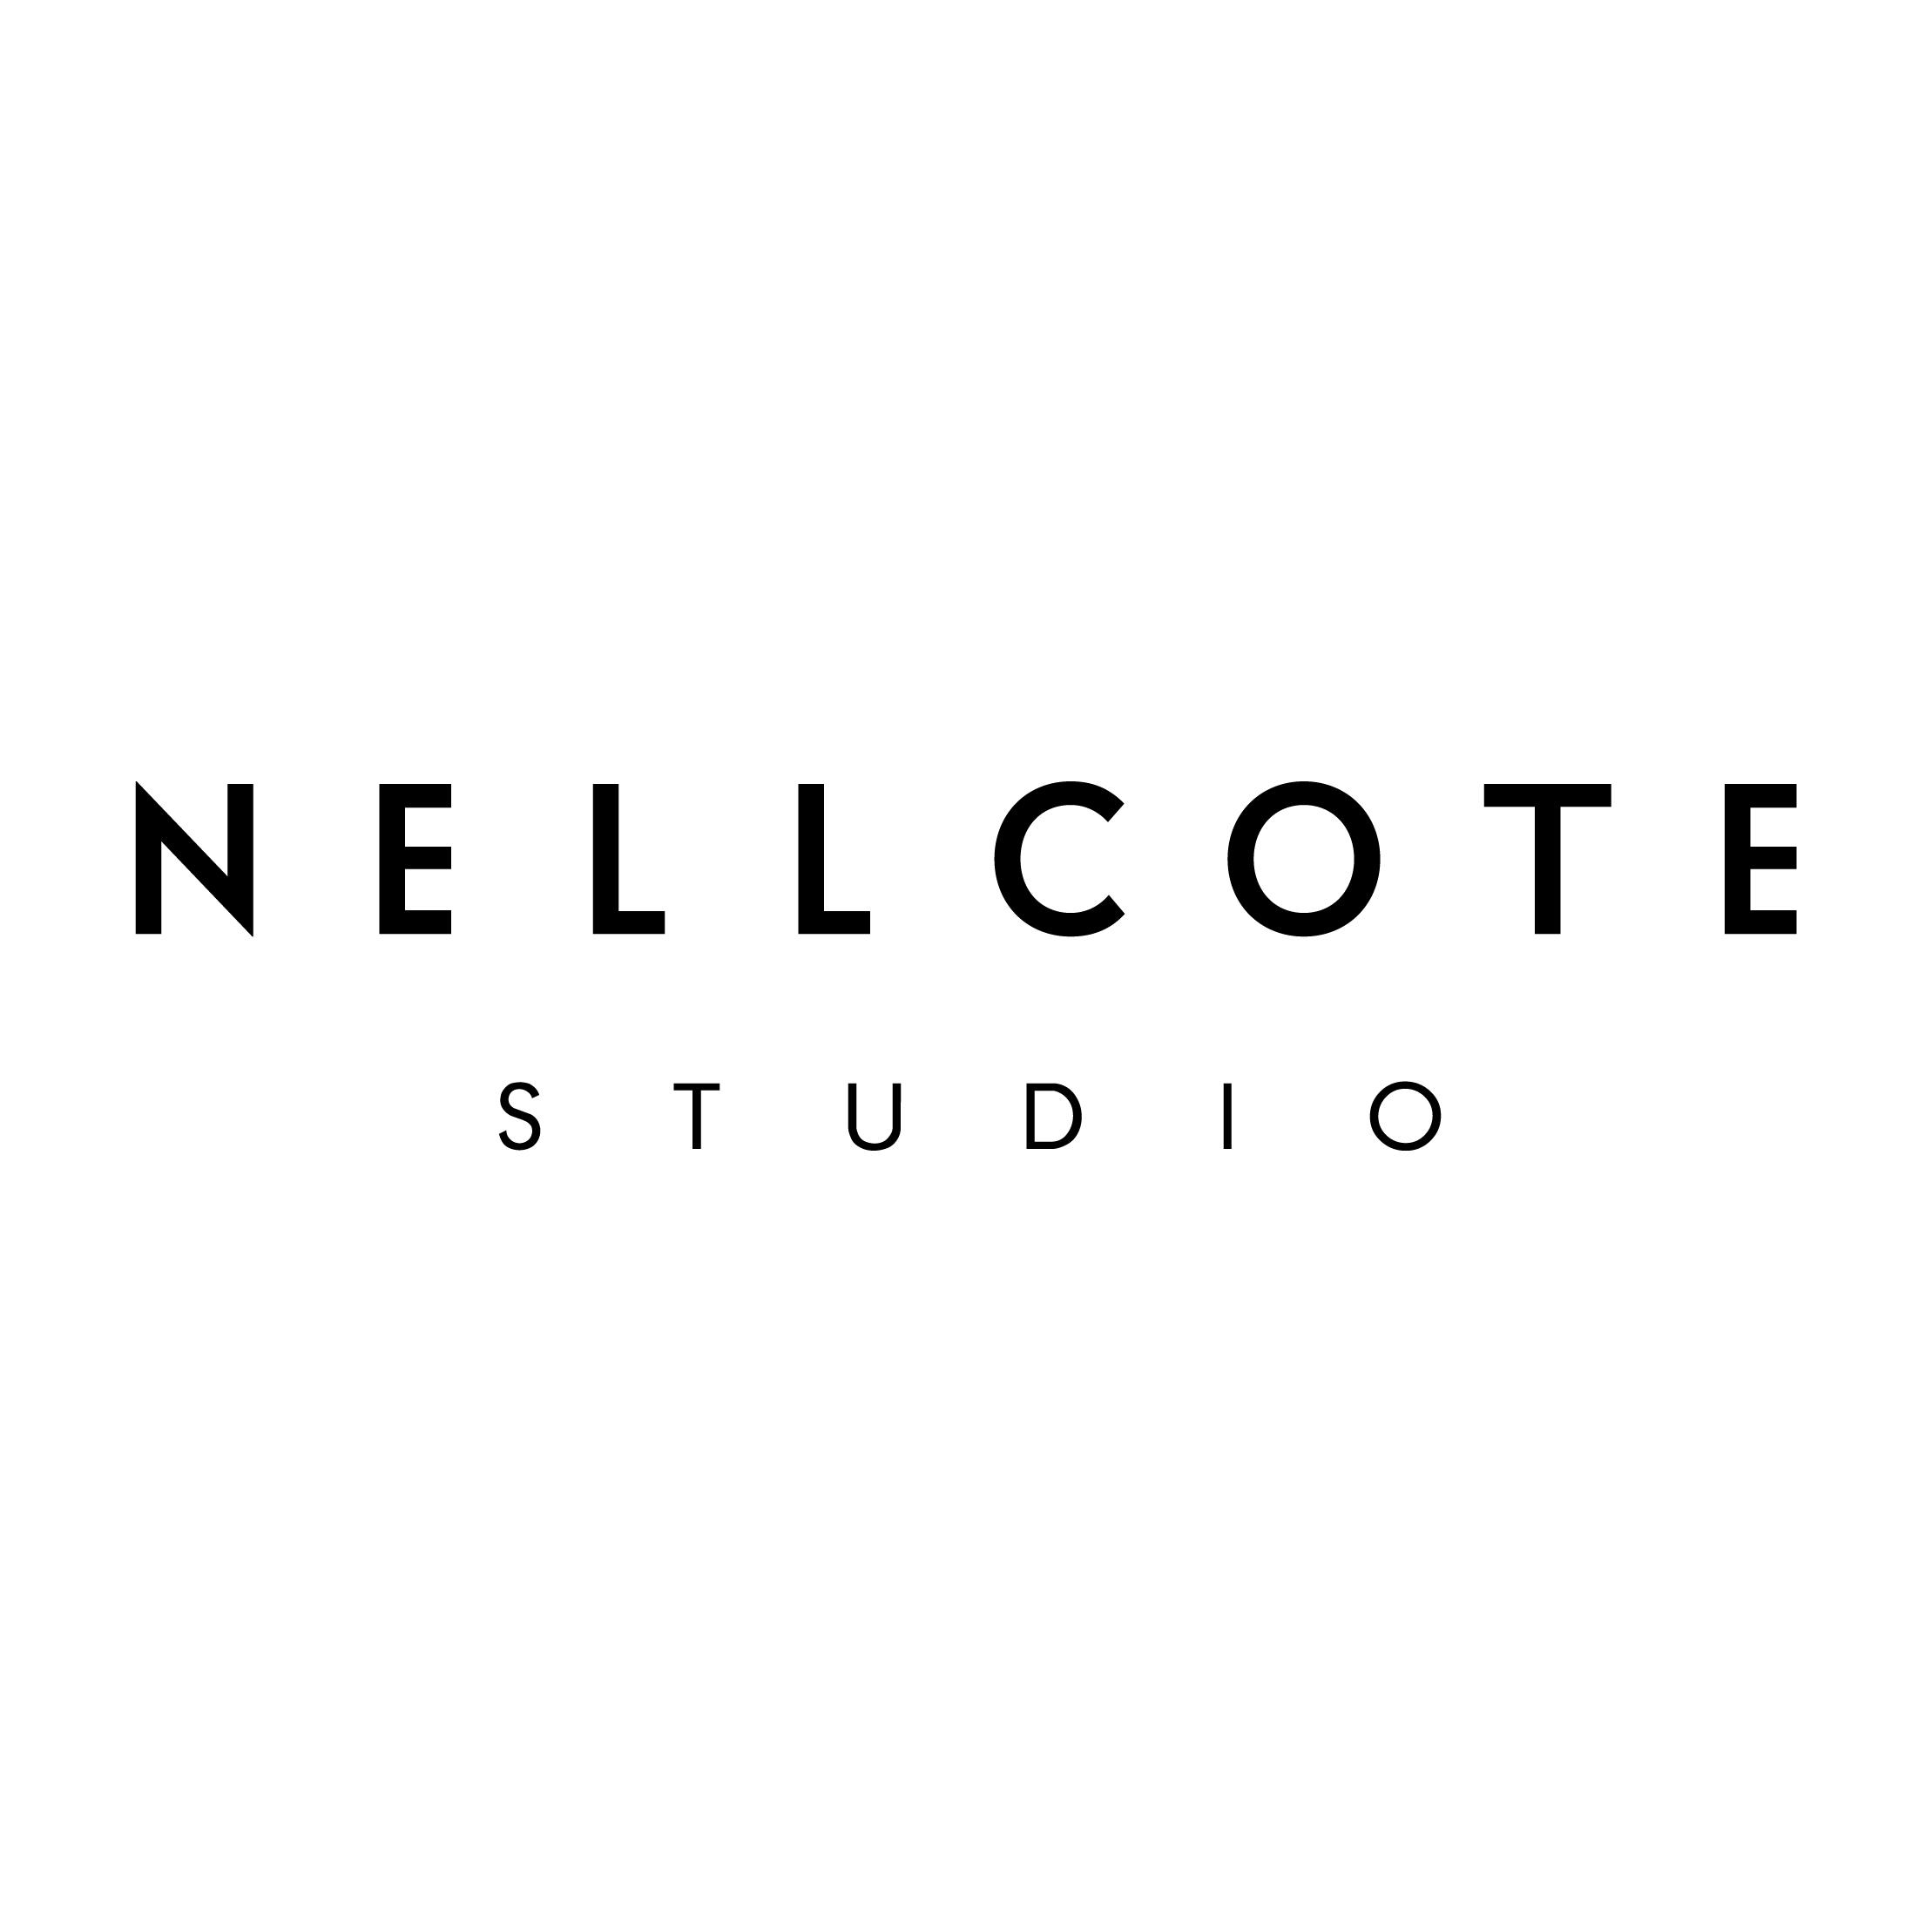 Nellcote studio_black.jpg